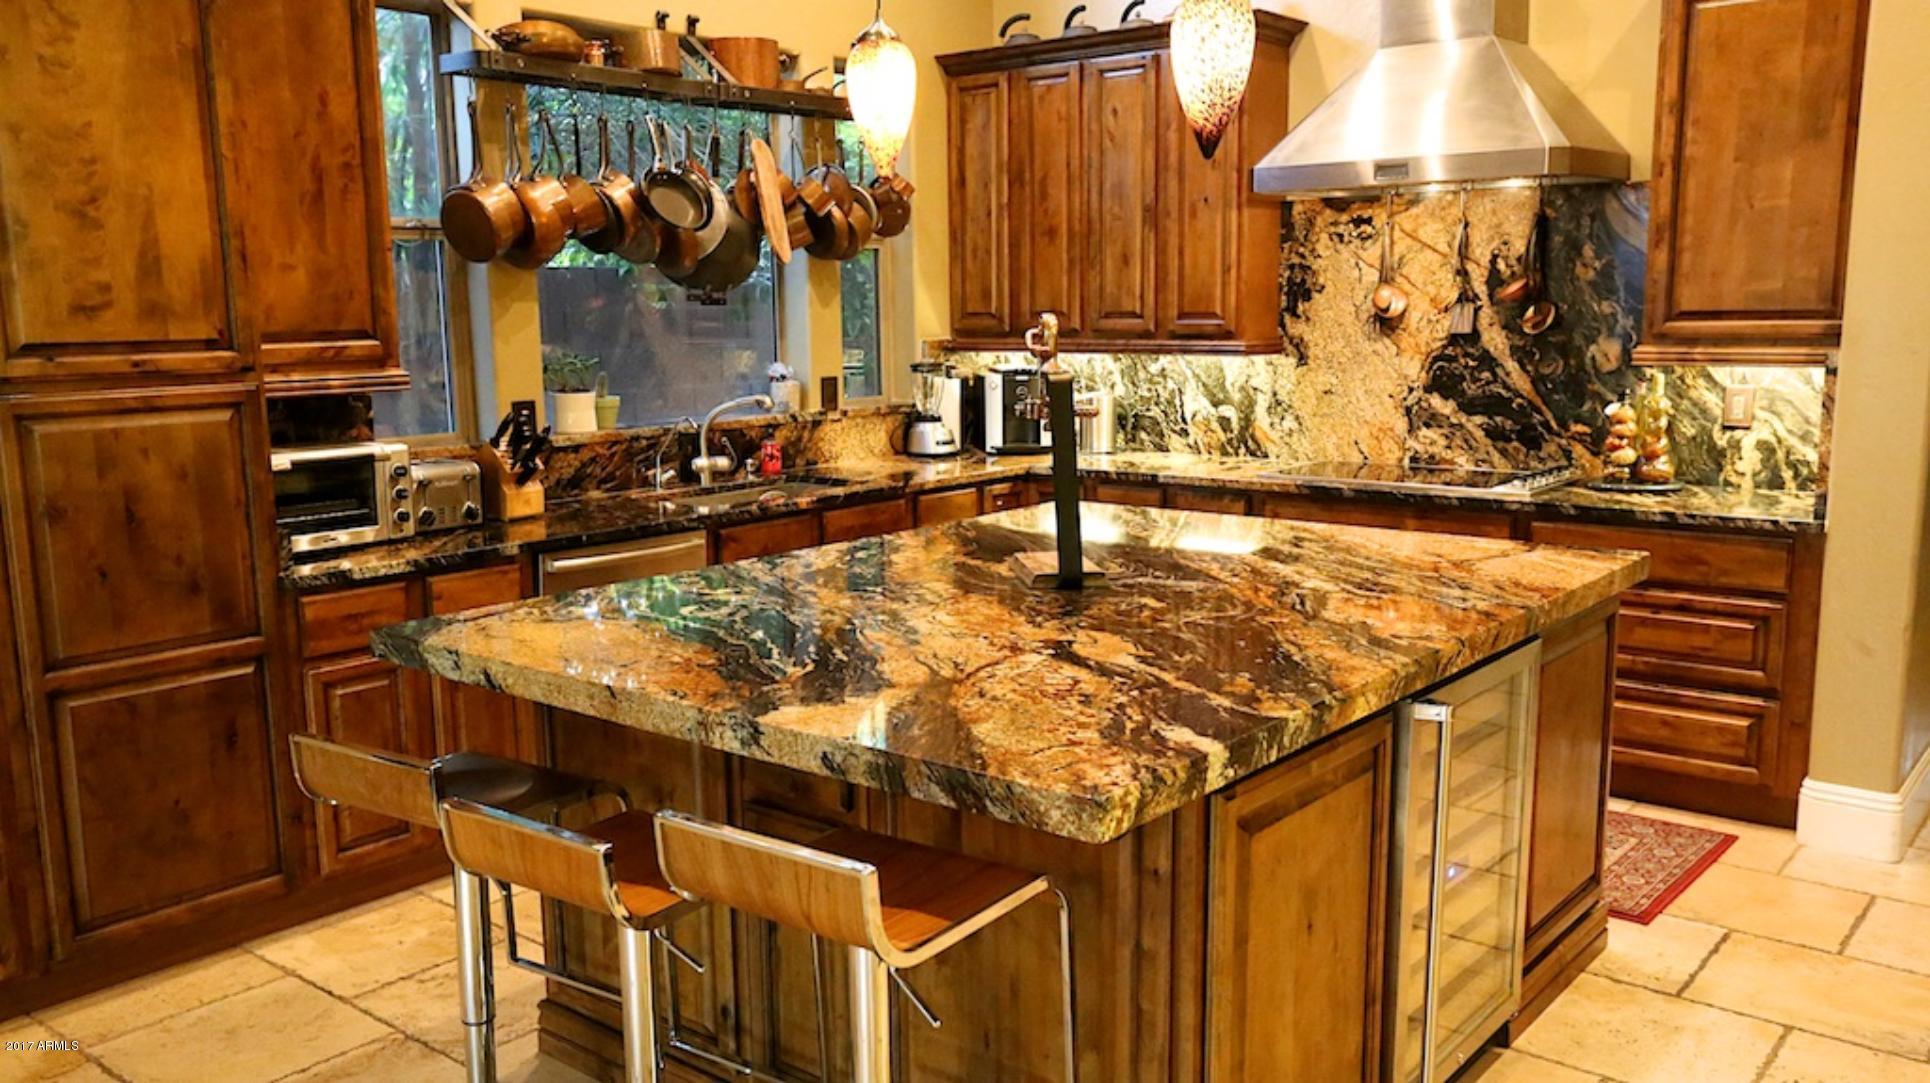 MLS 5690906 7879 S STEPHANIE Lane, Tempe, AZ 85284 Tempe Homes for Rent